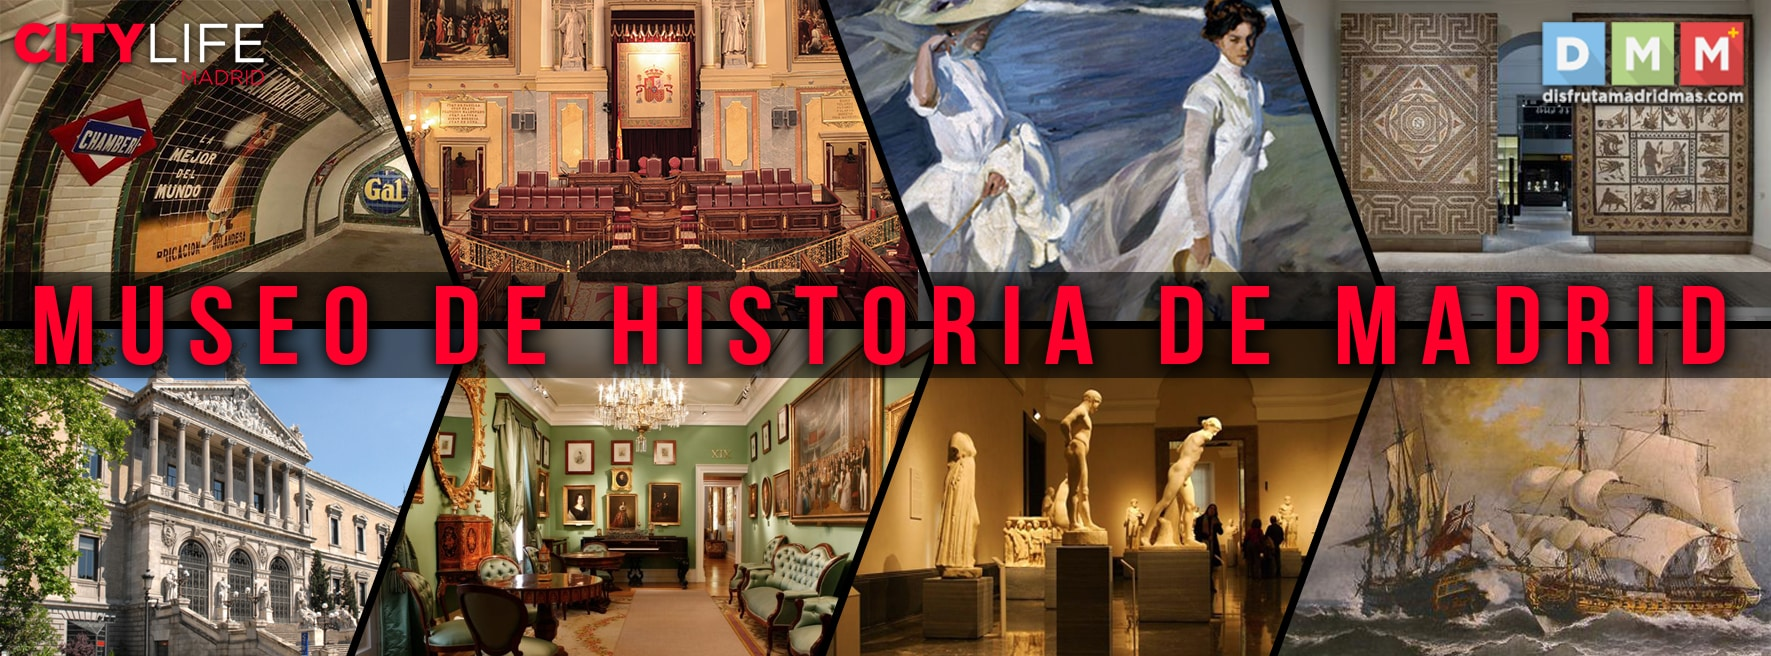 FREE TOUR: MUSEO DE LA HISTORIA DE MADRID